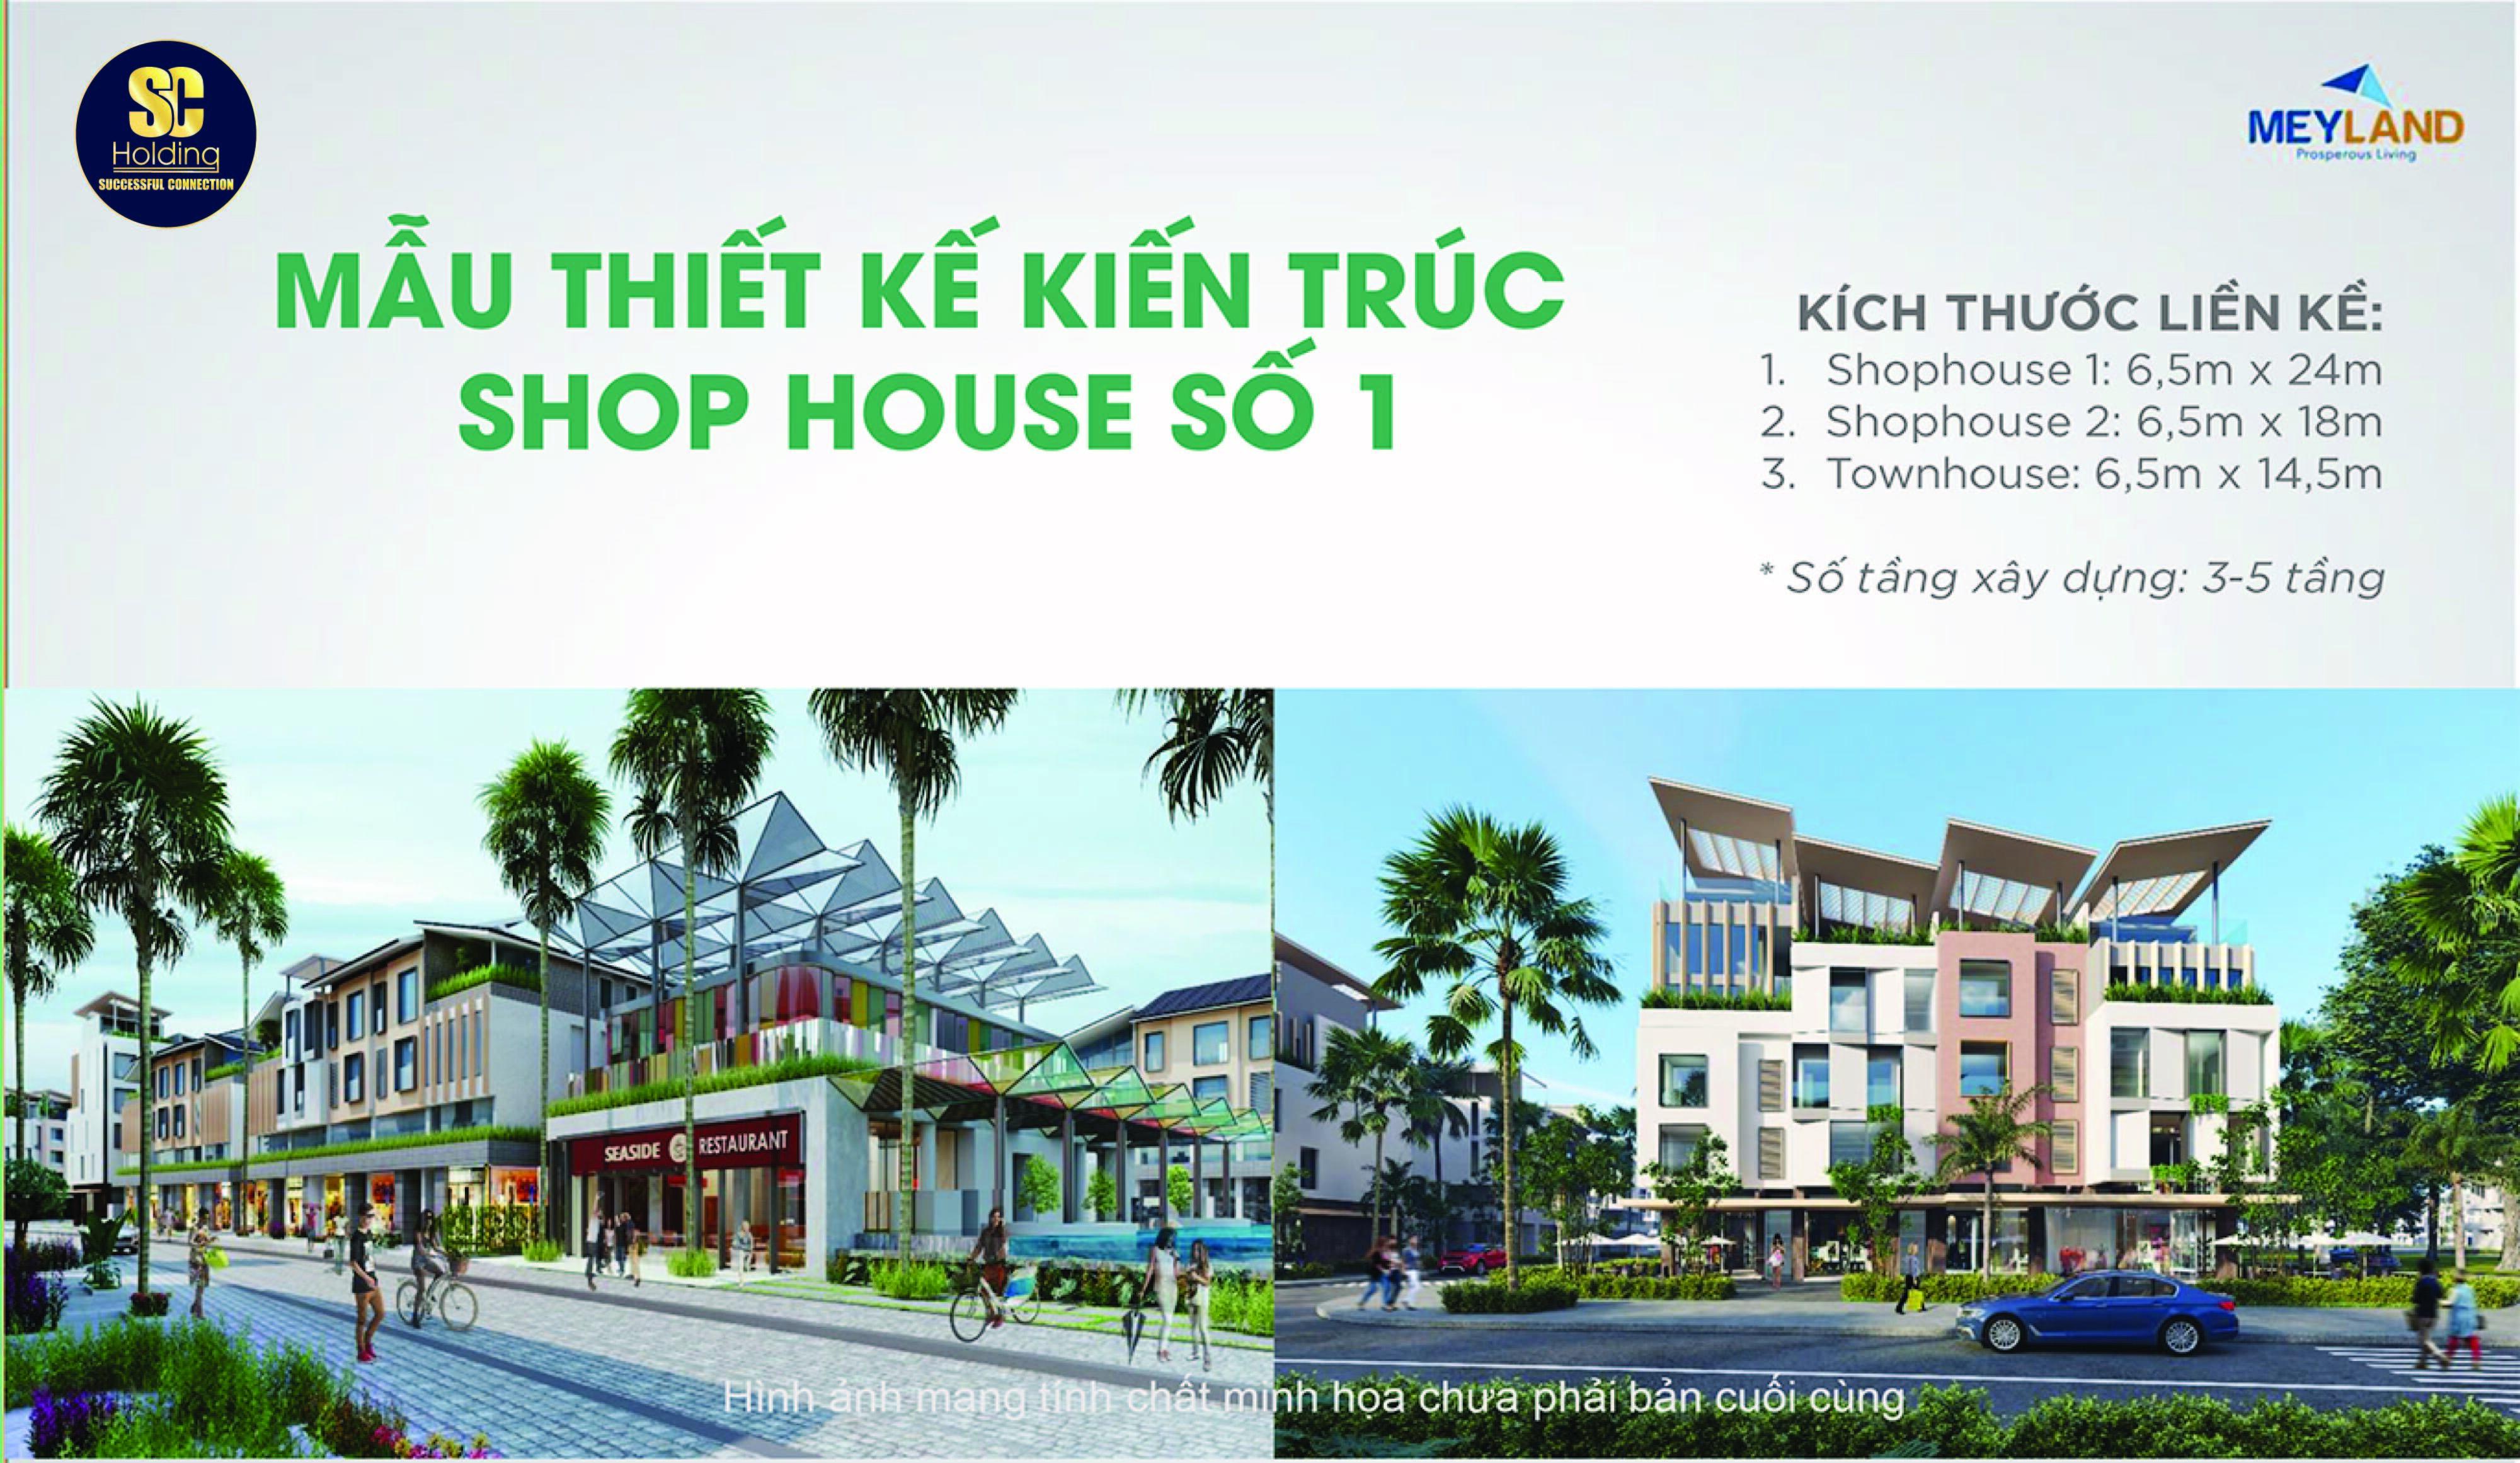 Mẫu thiết kế Shophouse 1